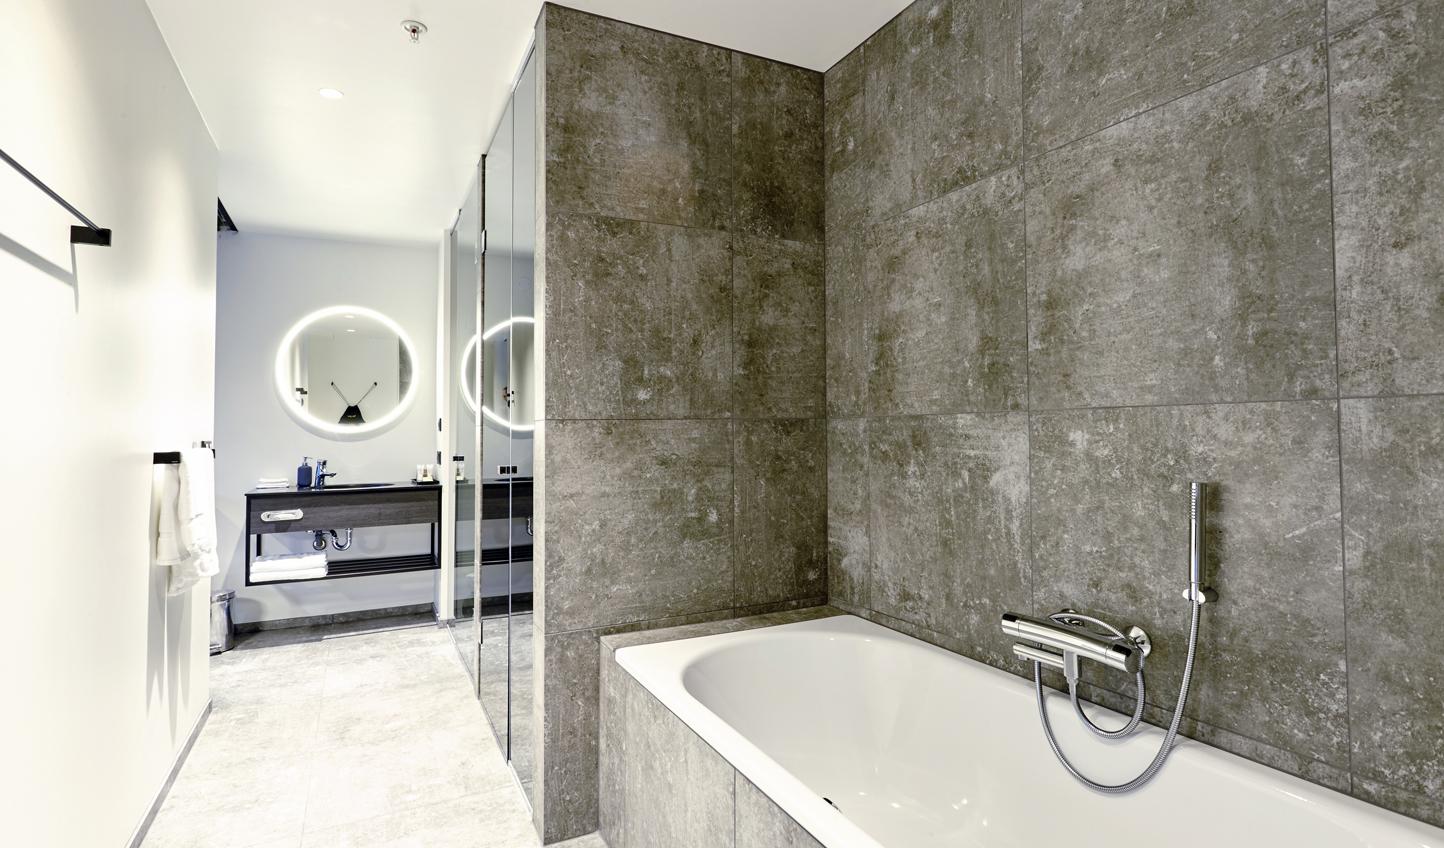 Contemporary design in the bathroom